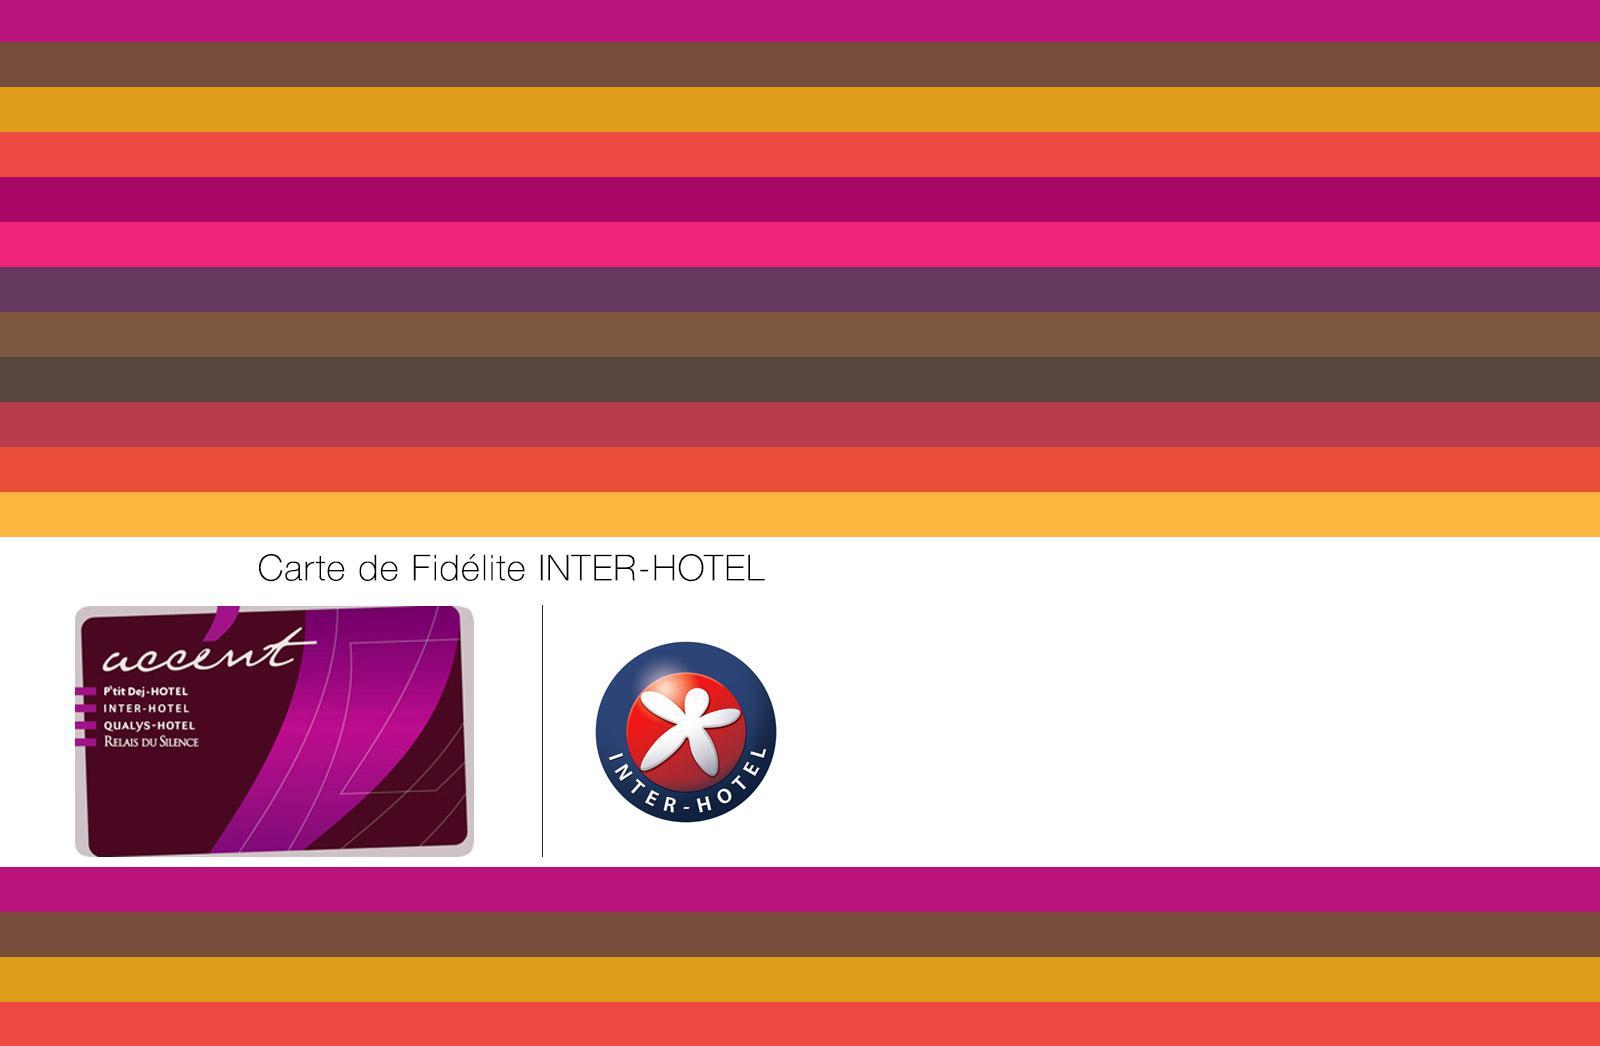 carte de fidelite inter-hotel